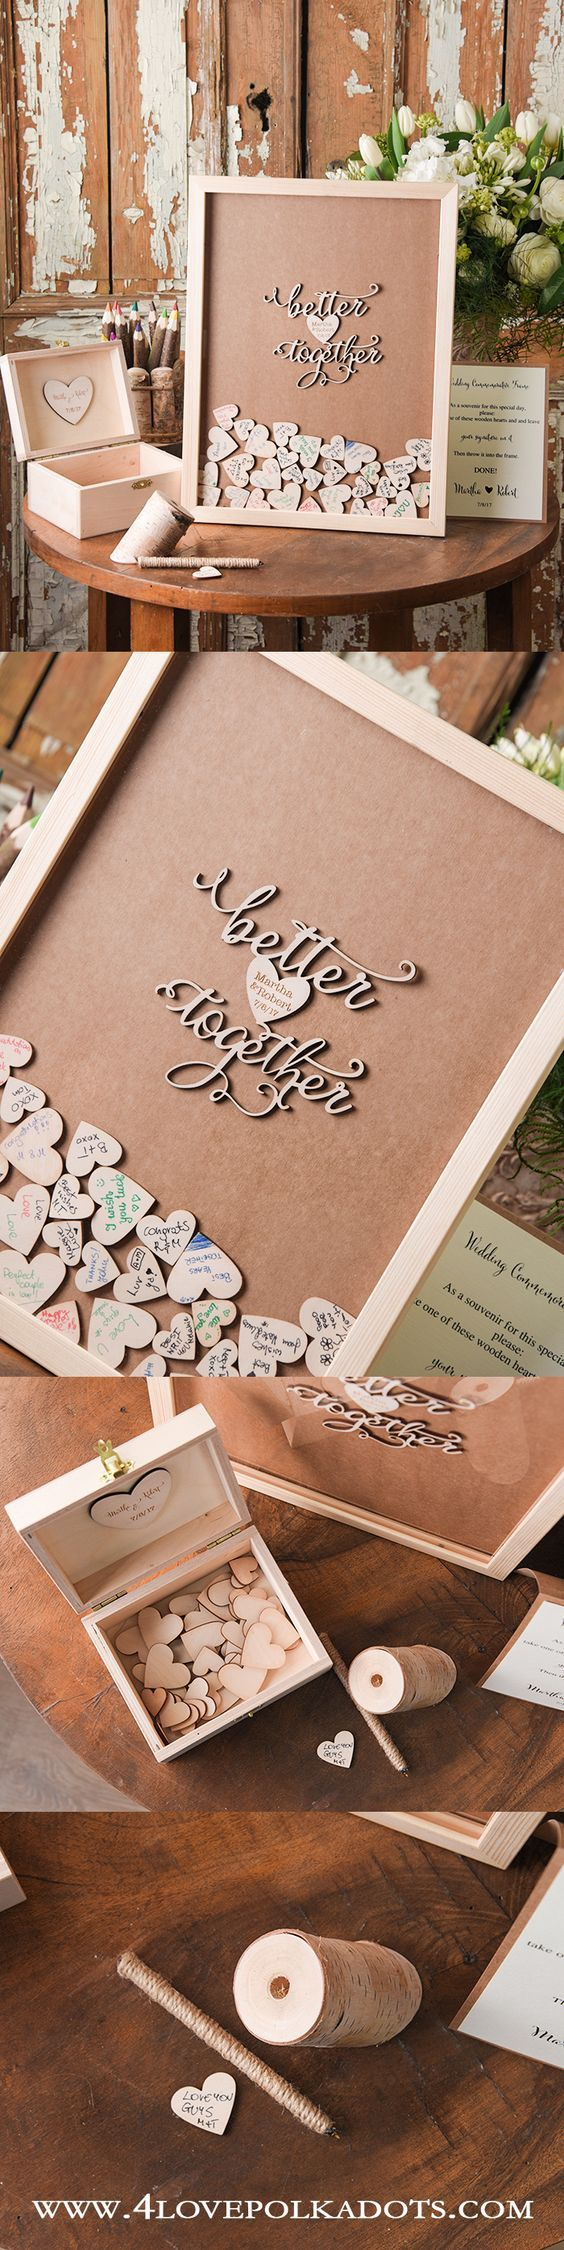 Alternative Wedding Guest Book || @4lovepolkadots